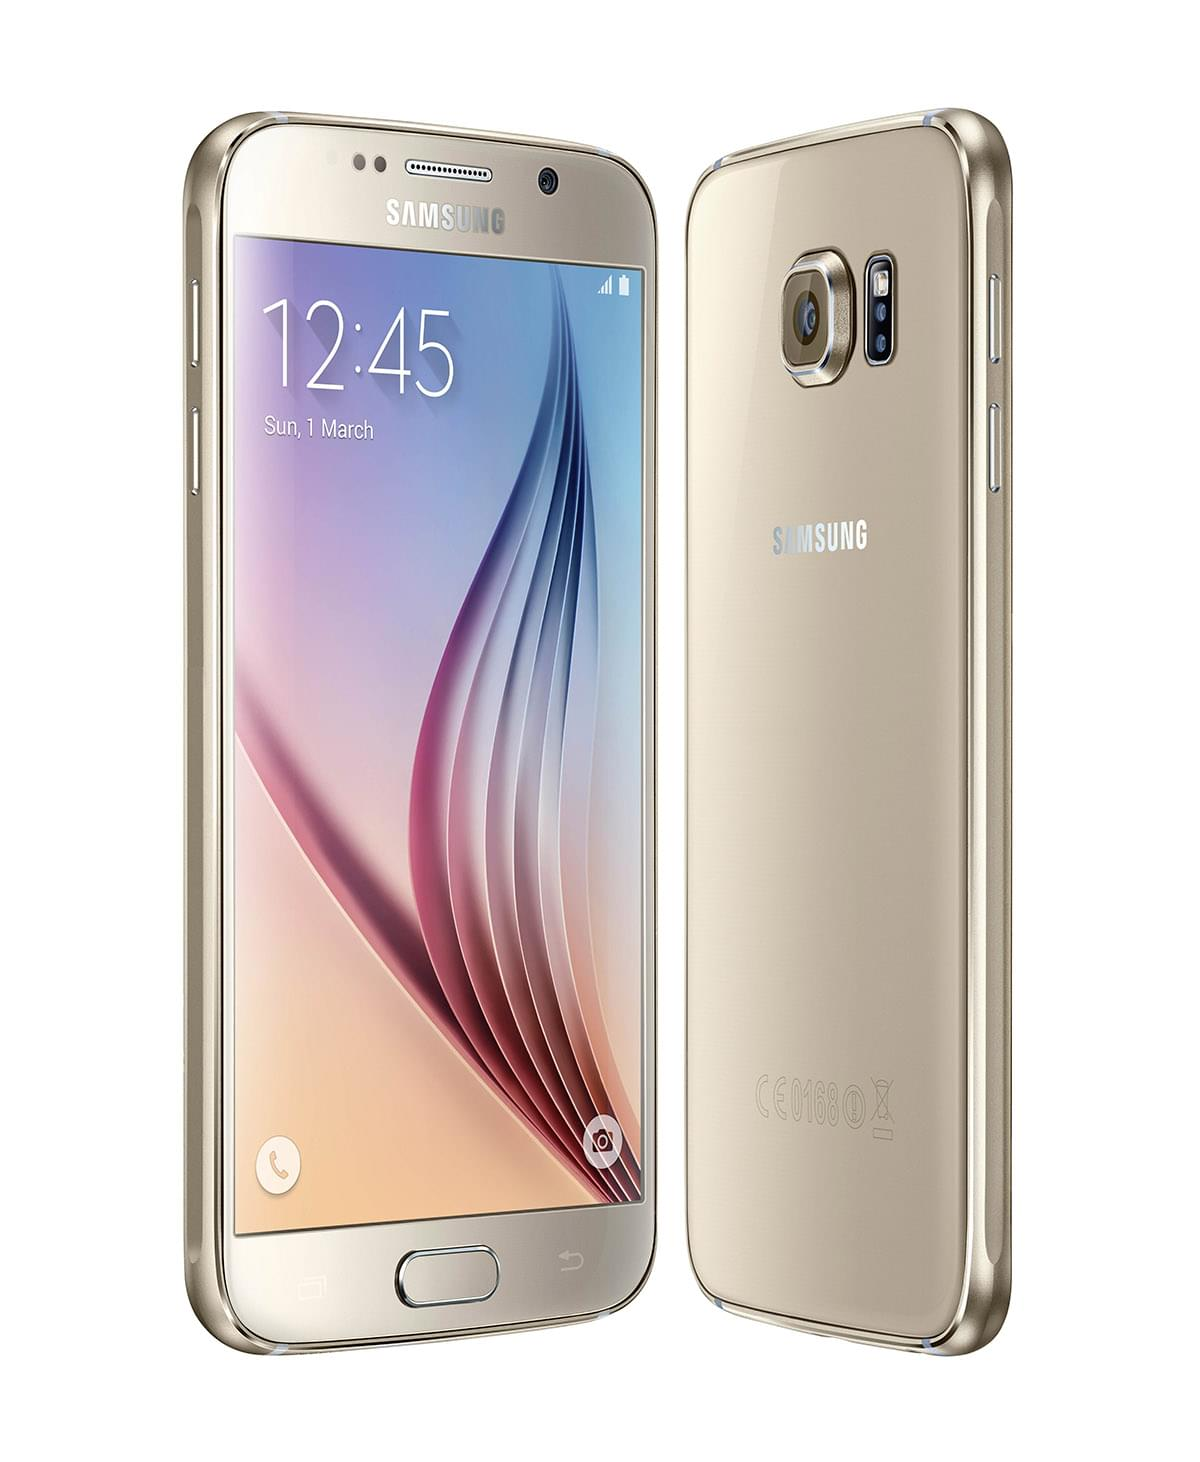 Samsung Galaxy S6 128Go SM-G920F White - Achat / Vente Téléphonie sur Cybertek.fr - 0